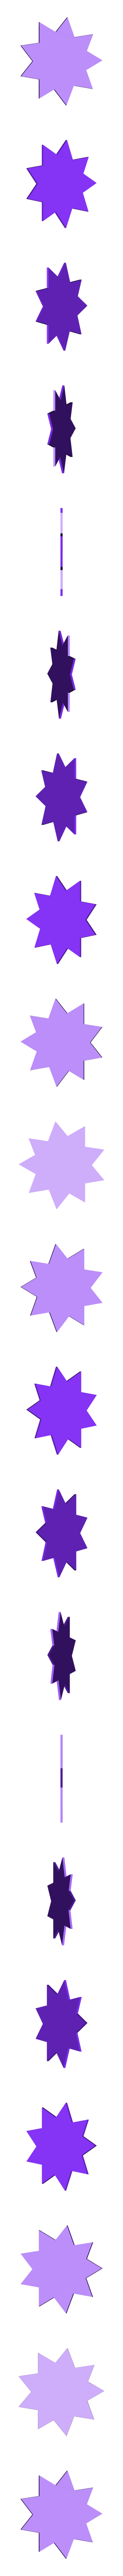 étoiles4.stl Download STL file snow stars • Model to 3D print, catf3d